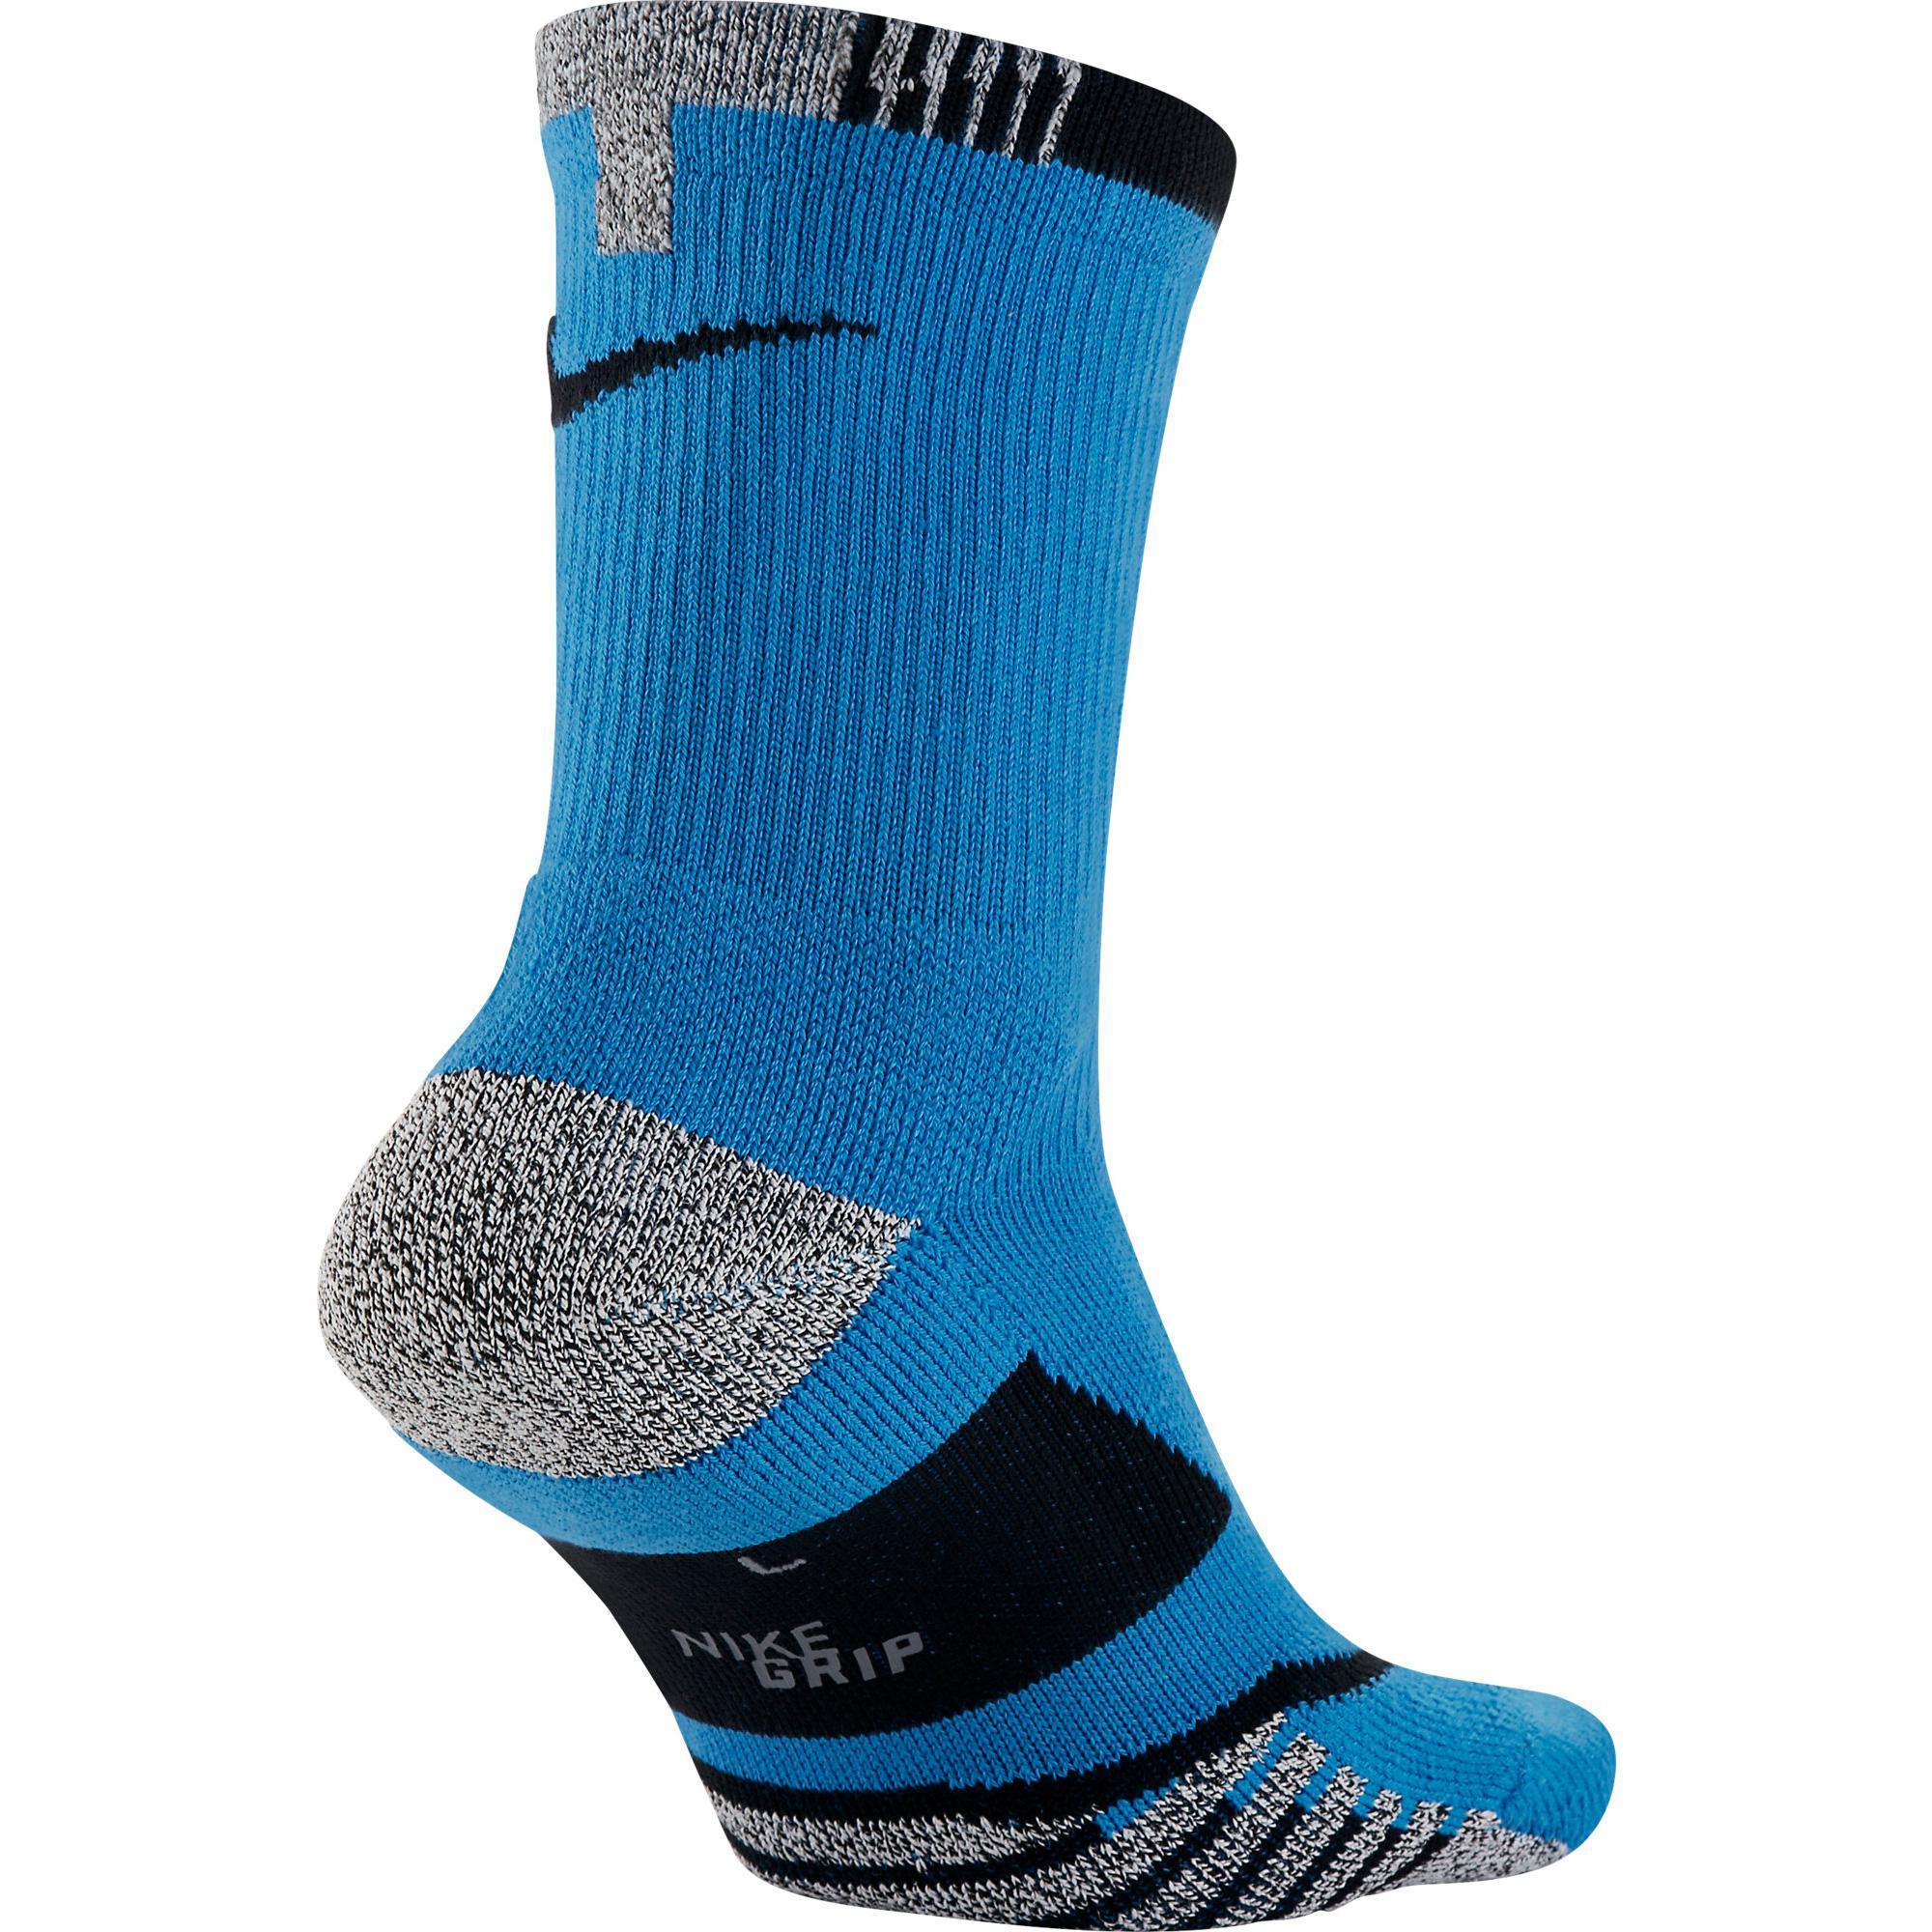 1b9e12528 Nike Grip Elite Crew Tennis Socks (1 Pair) - Light Photo Blue ...